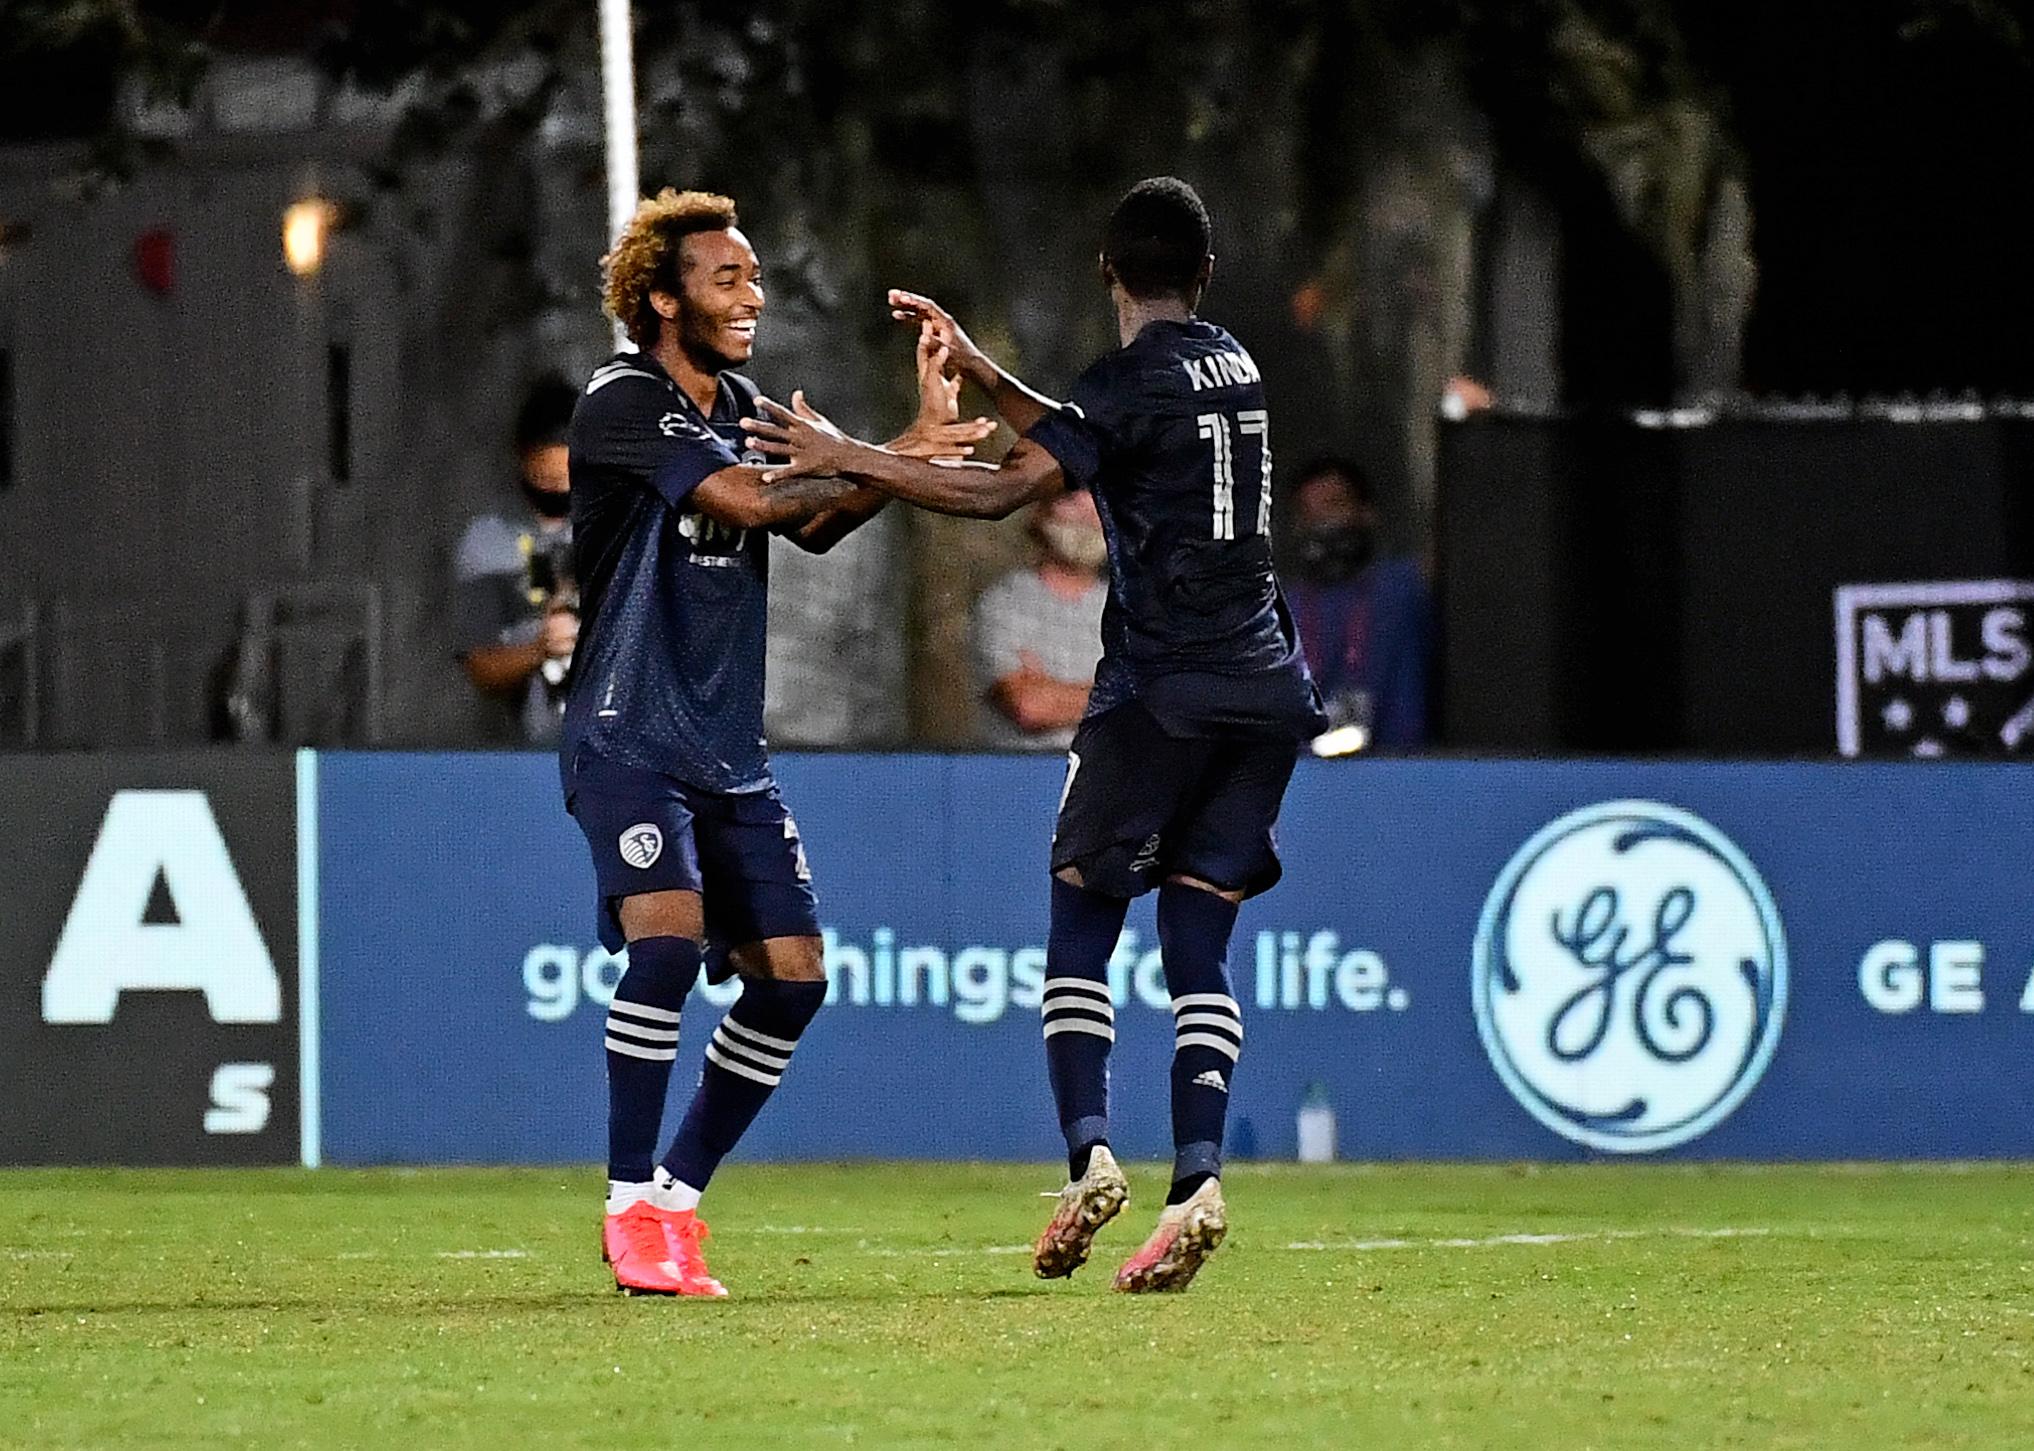 MLS: Sporting Kansas City vs Vancouver Whitecaps FC